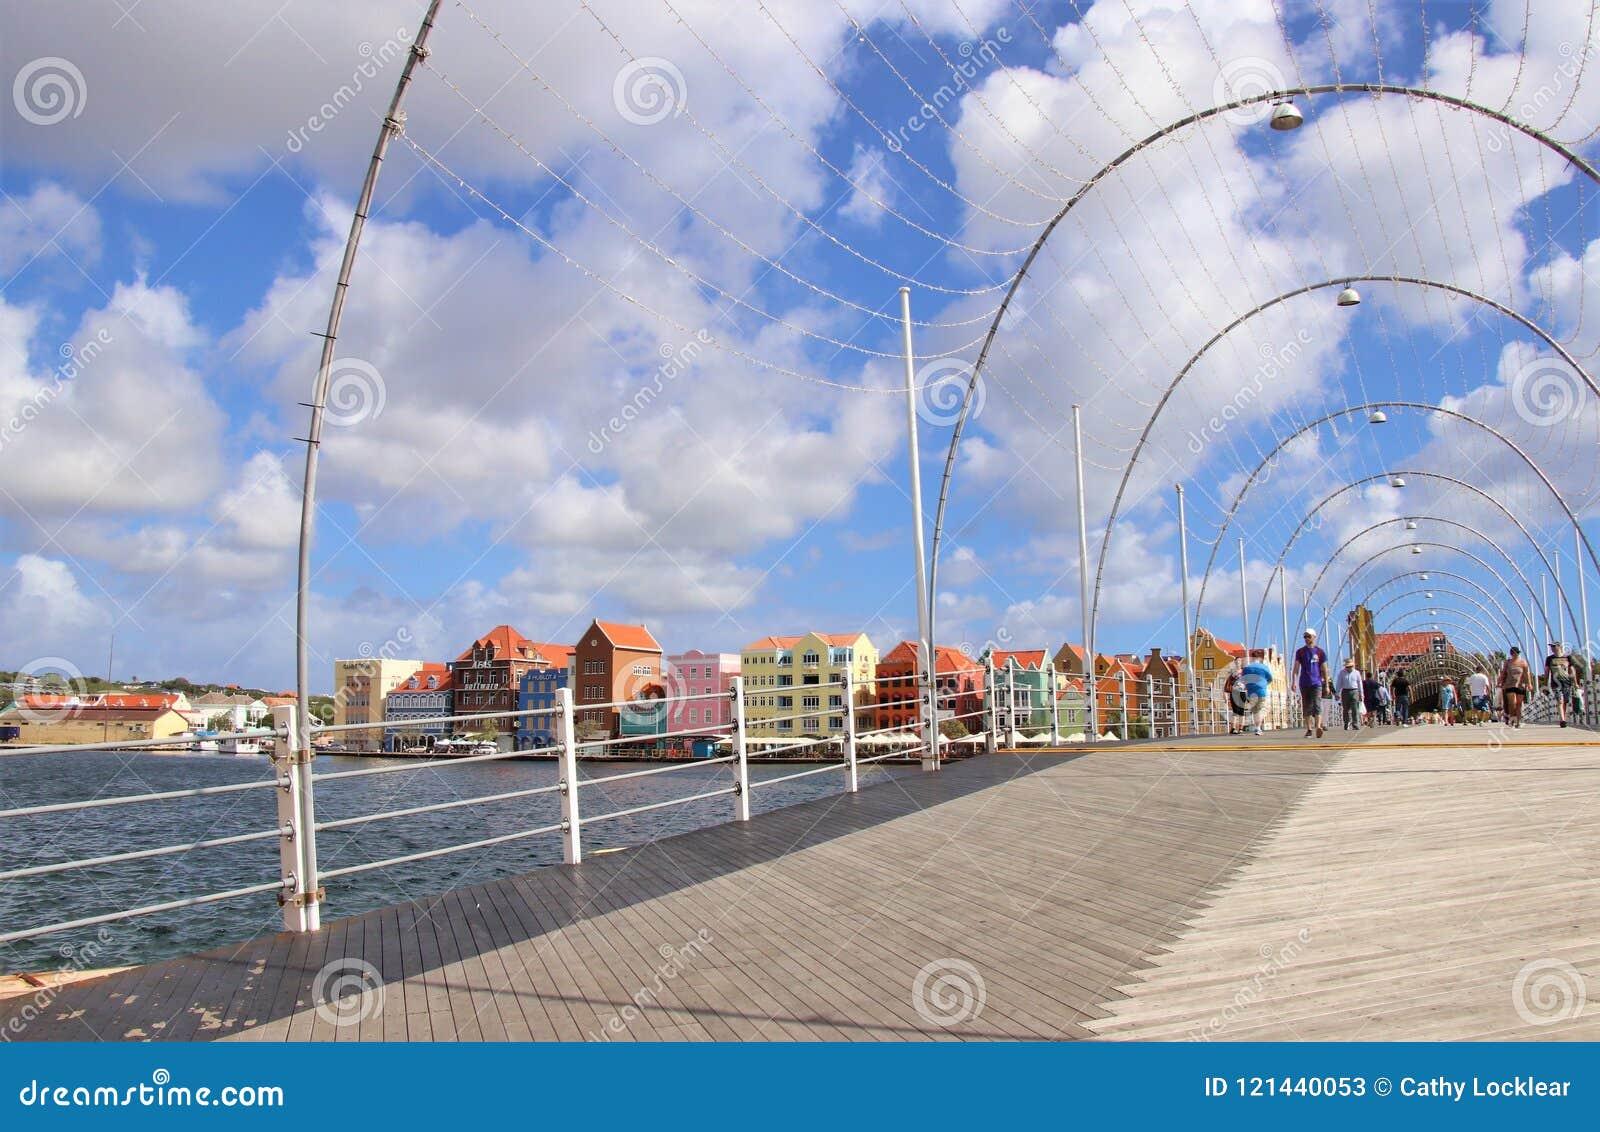 Willemstad, Curaçao - 12/17/17: Reina Emma Pontoon Bridge en Willemstad, Curaçao, en el Netherland Antillas